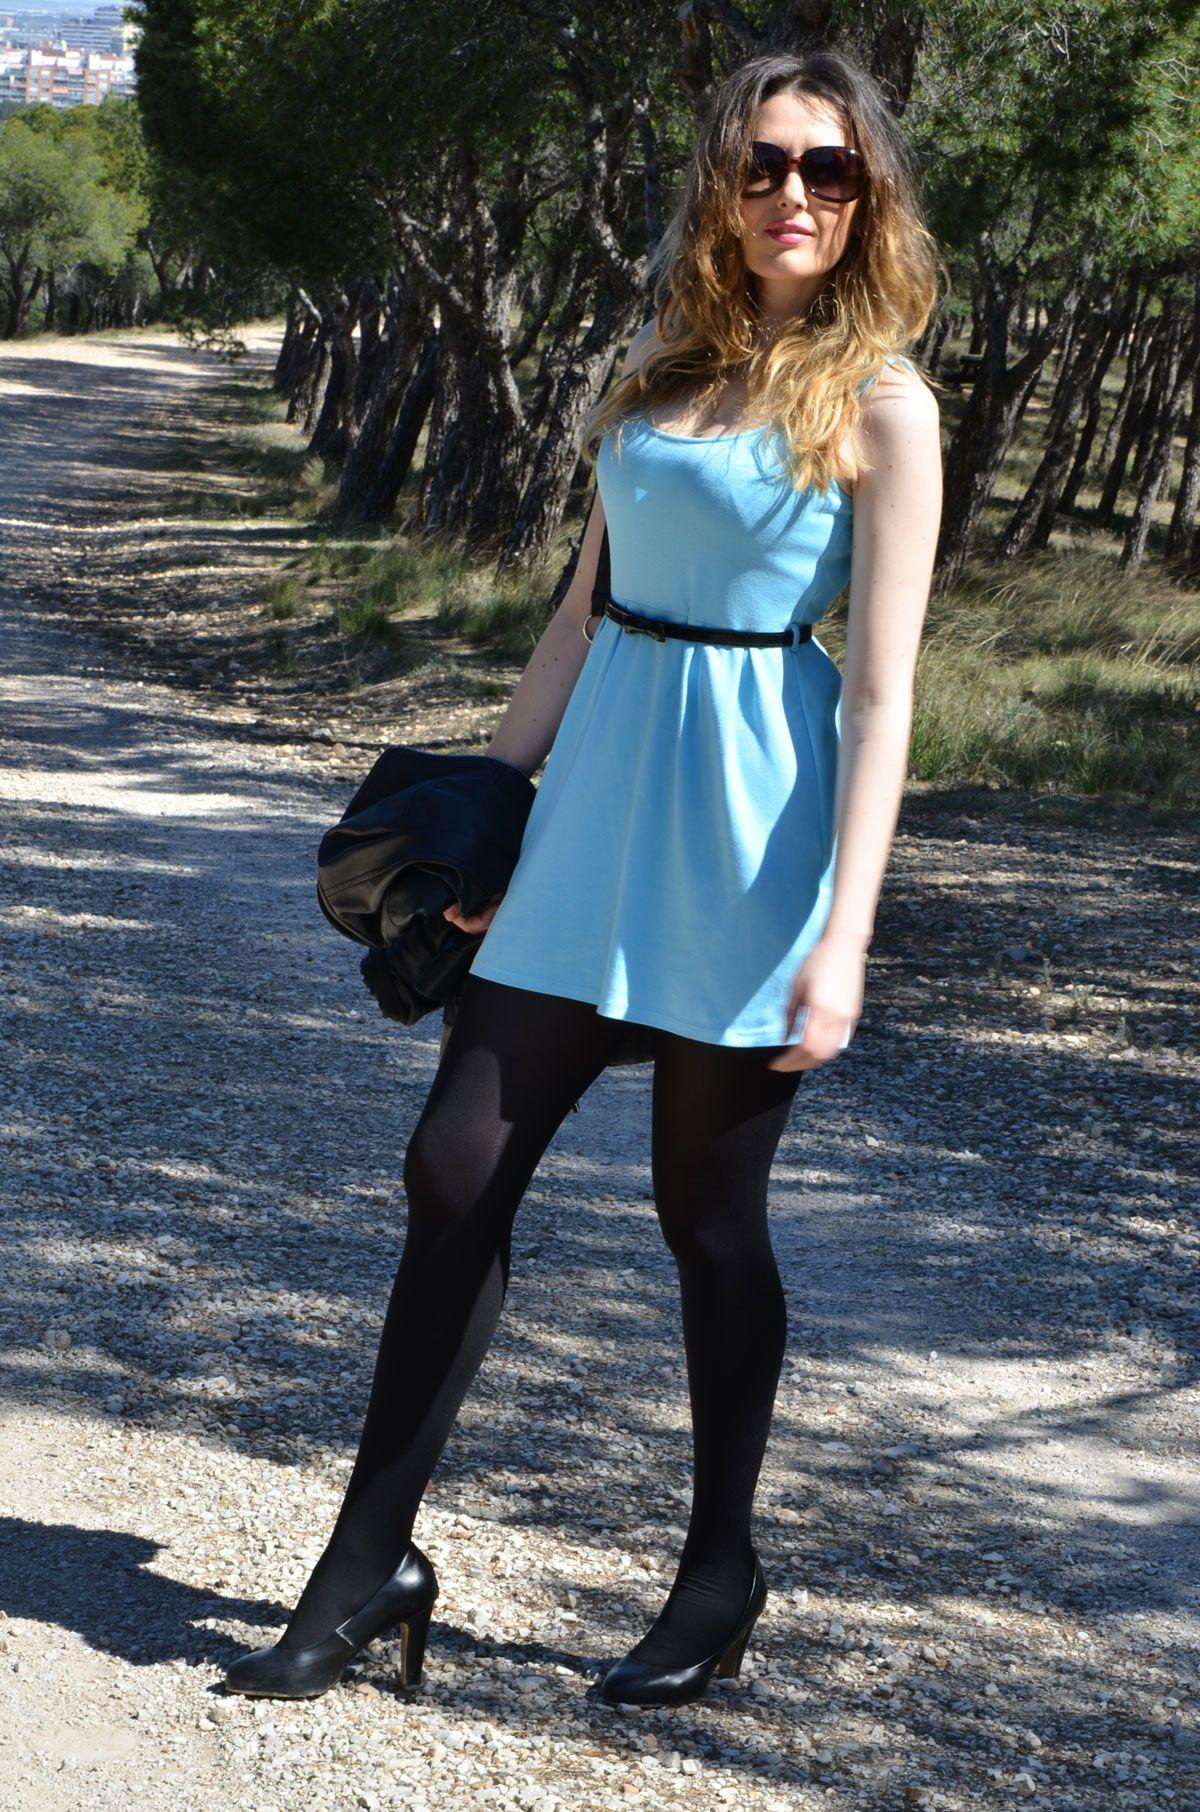 Baby Blue Dress Http Oneusefashion Wordpress Com 2014 04 11 Baby Blue Dress Dress With Stockings Baby Blue Dresses Miniskirt Outfits [ 1812 x 1200 Pixel ]